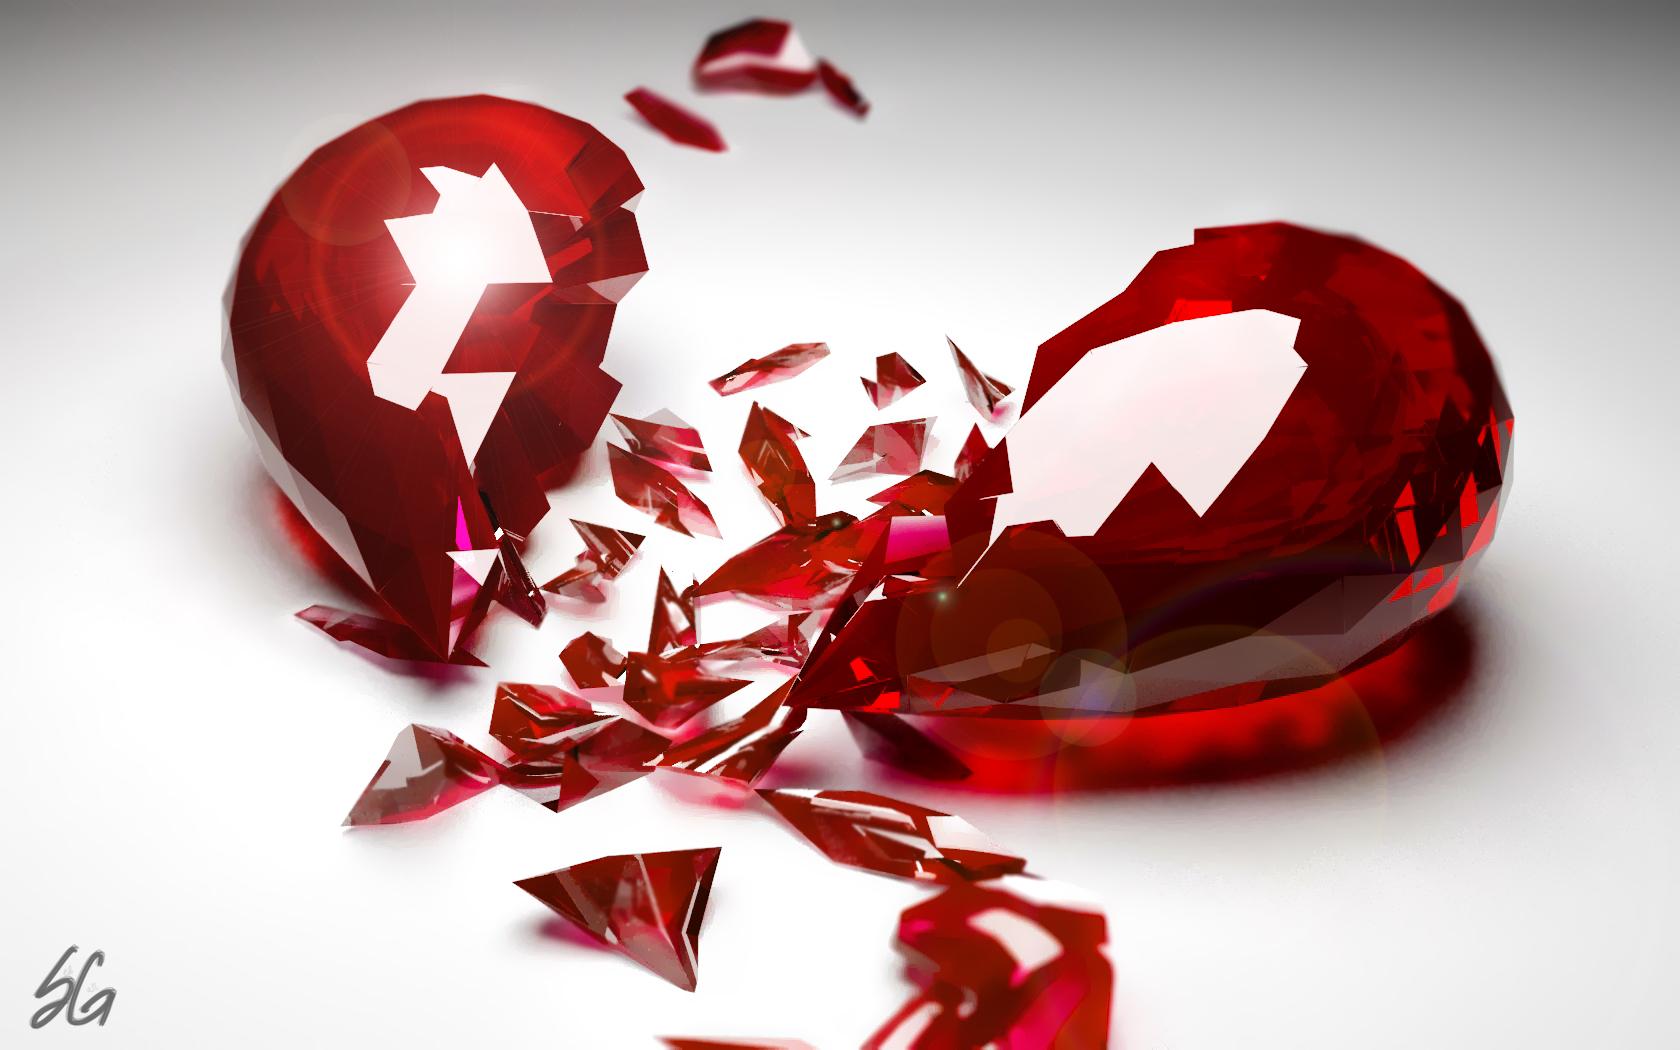 Shattered Heart by DemonVash08